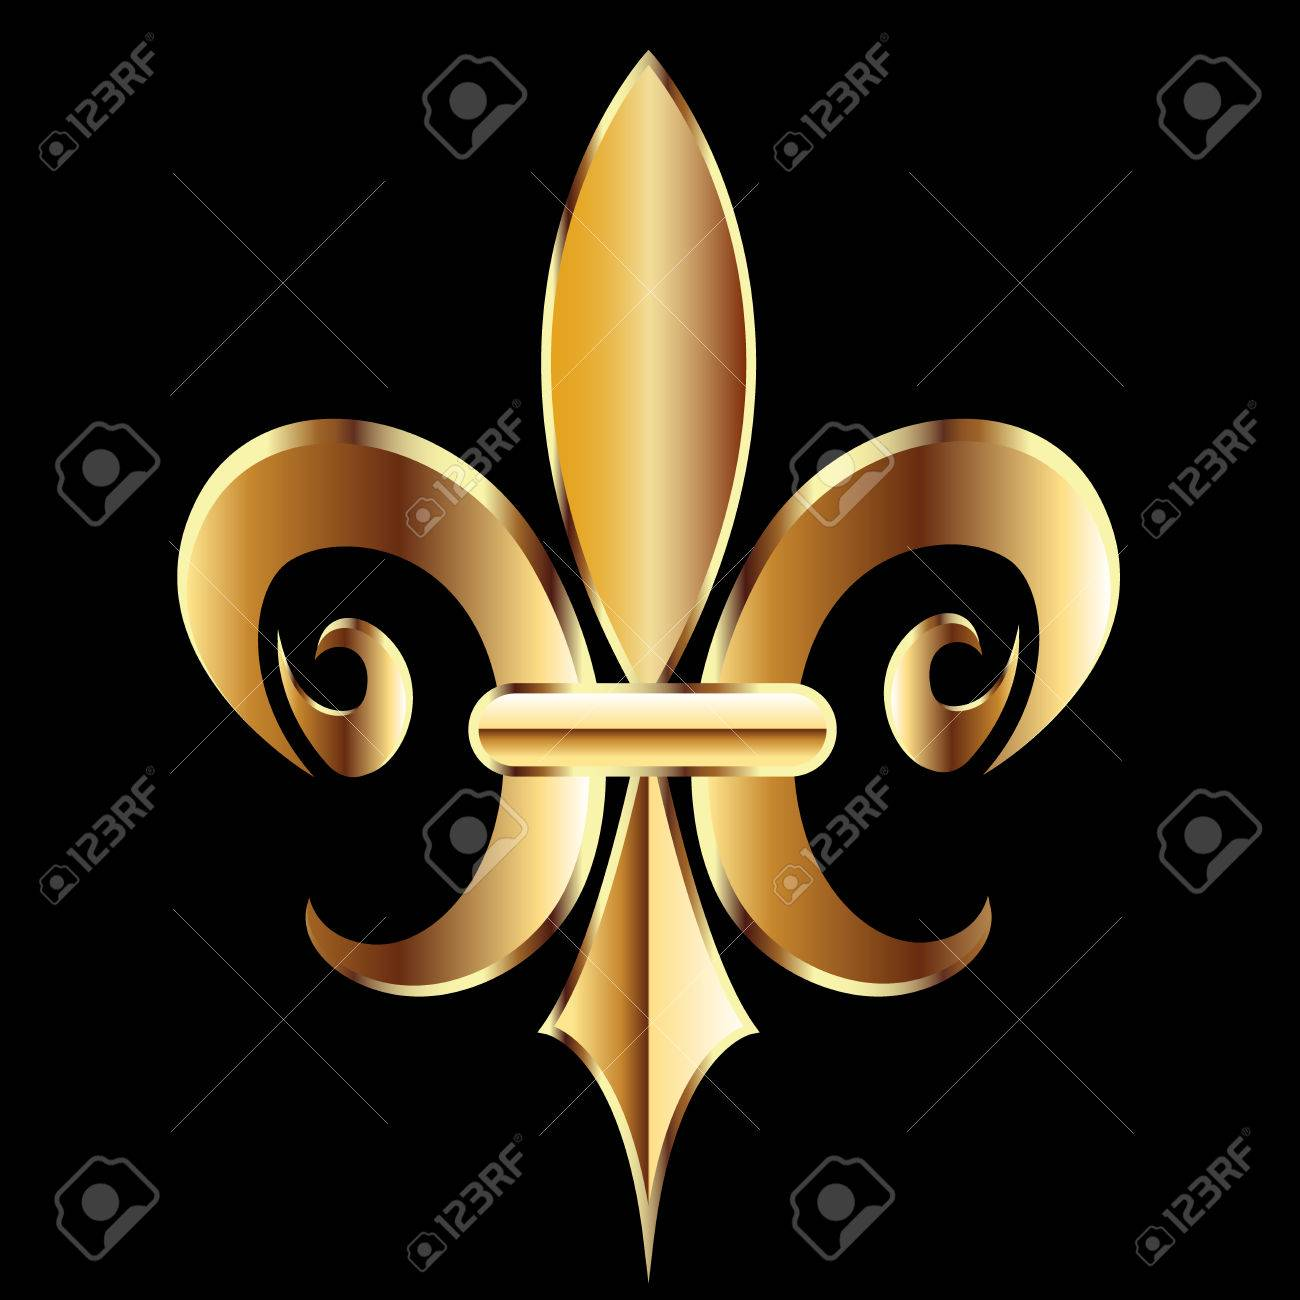 Gold Fleur De Lis Flower New Orleans Symbol Logo Template Royalty